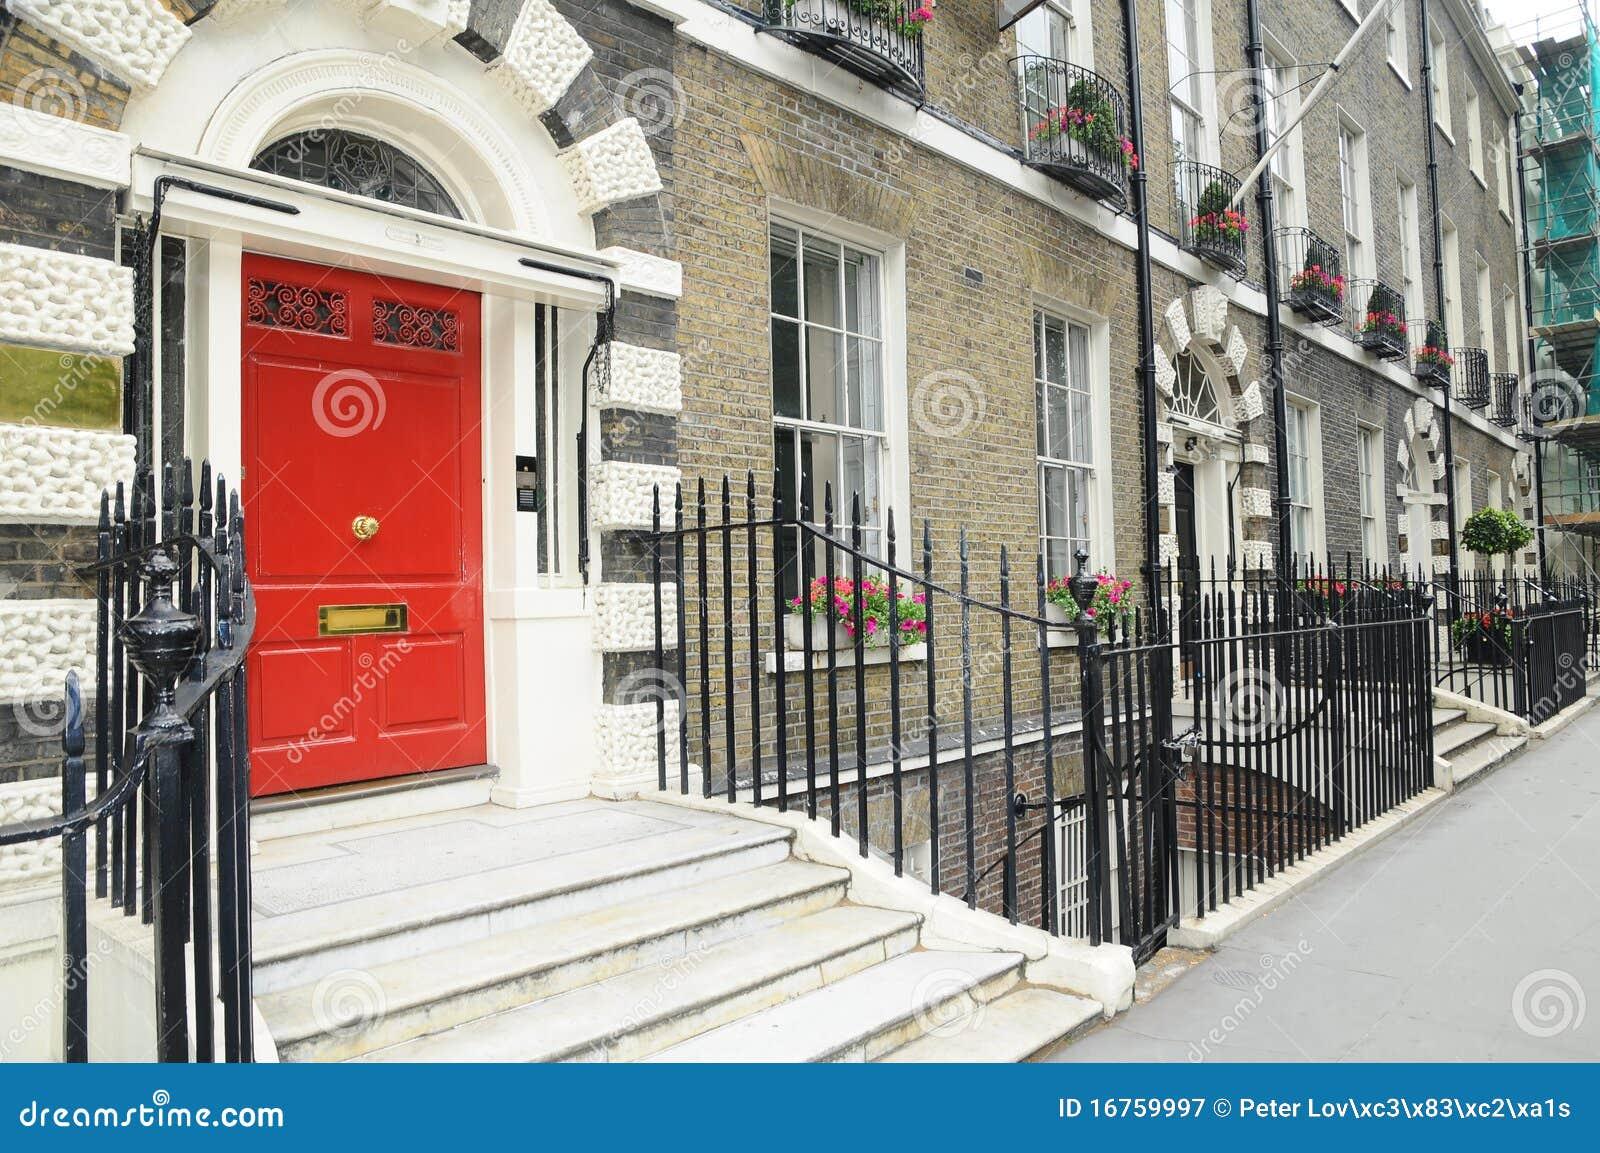 Casas inglesas viejas puerta roja imagen de archivo imagen de inglaterra implantaci n 16759997 - Imagenes de casas inglesas ...